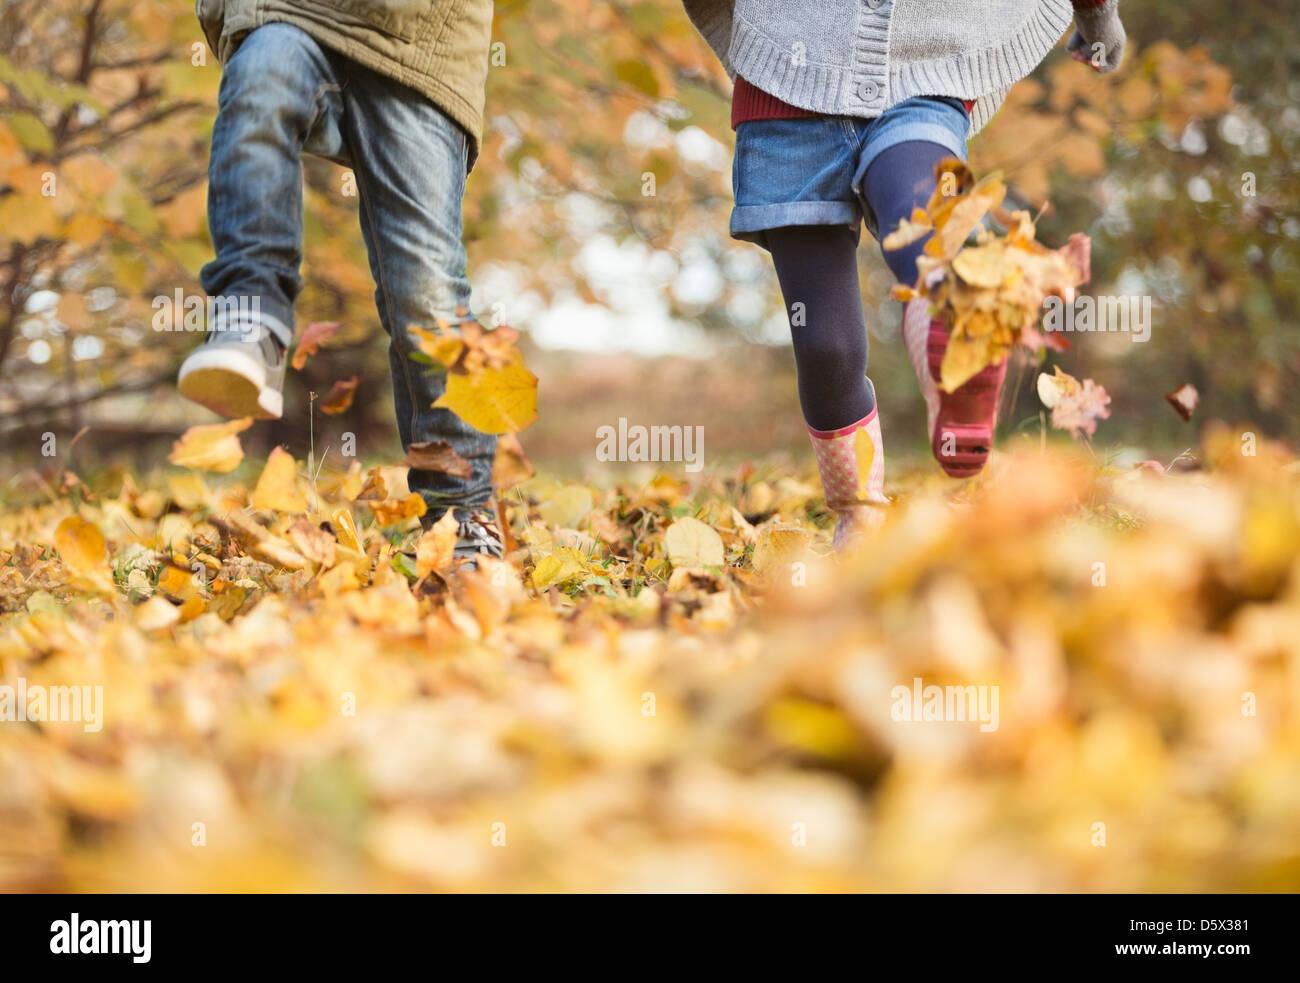 Children walking in autumn leaves - Stock Image